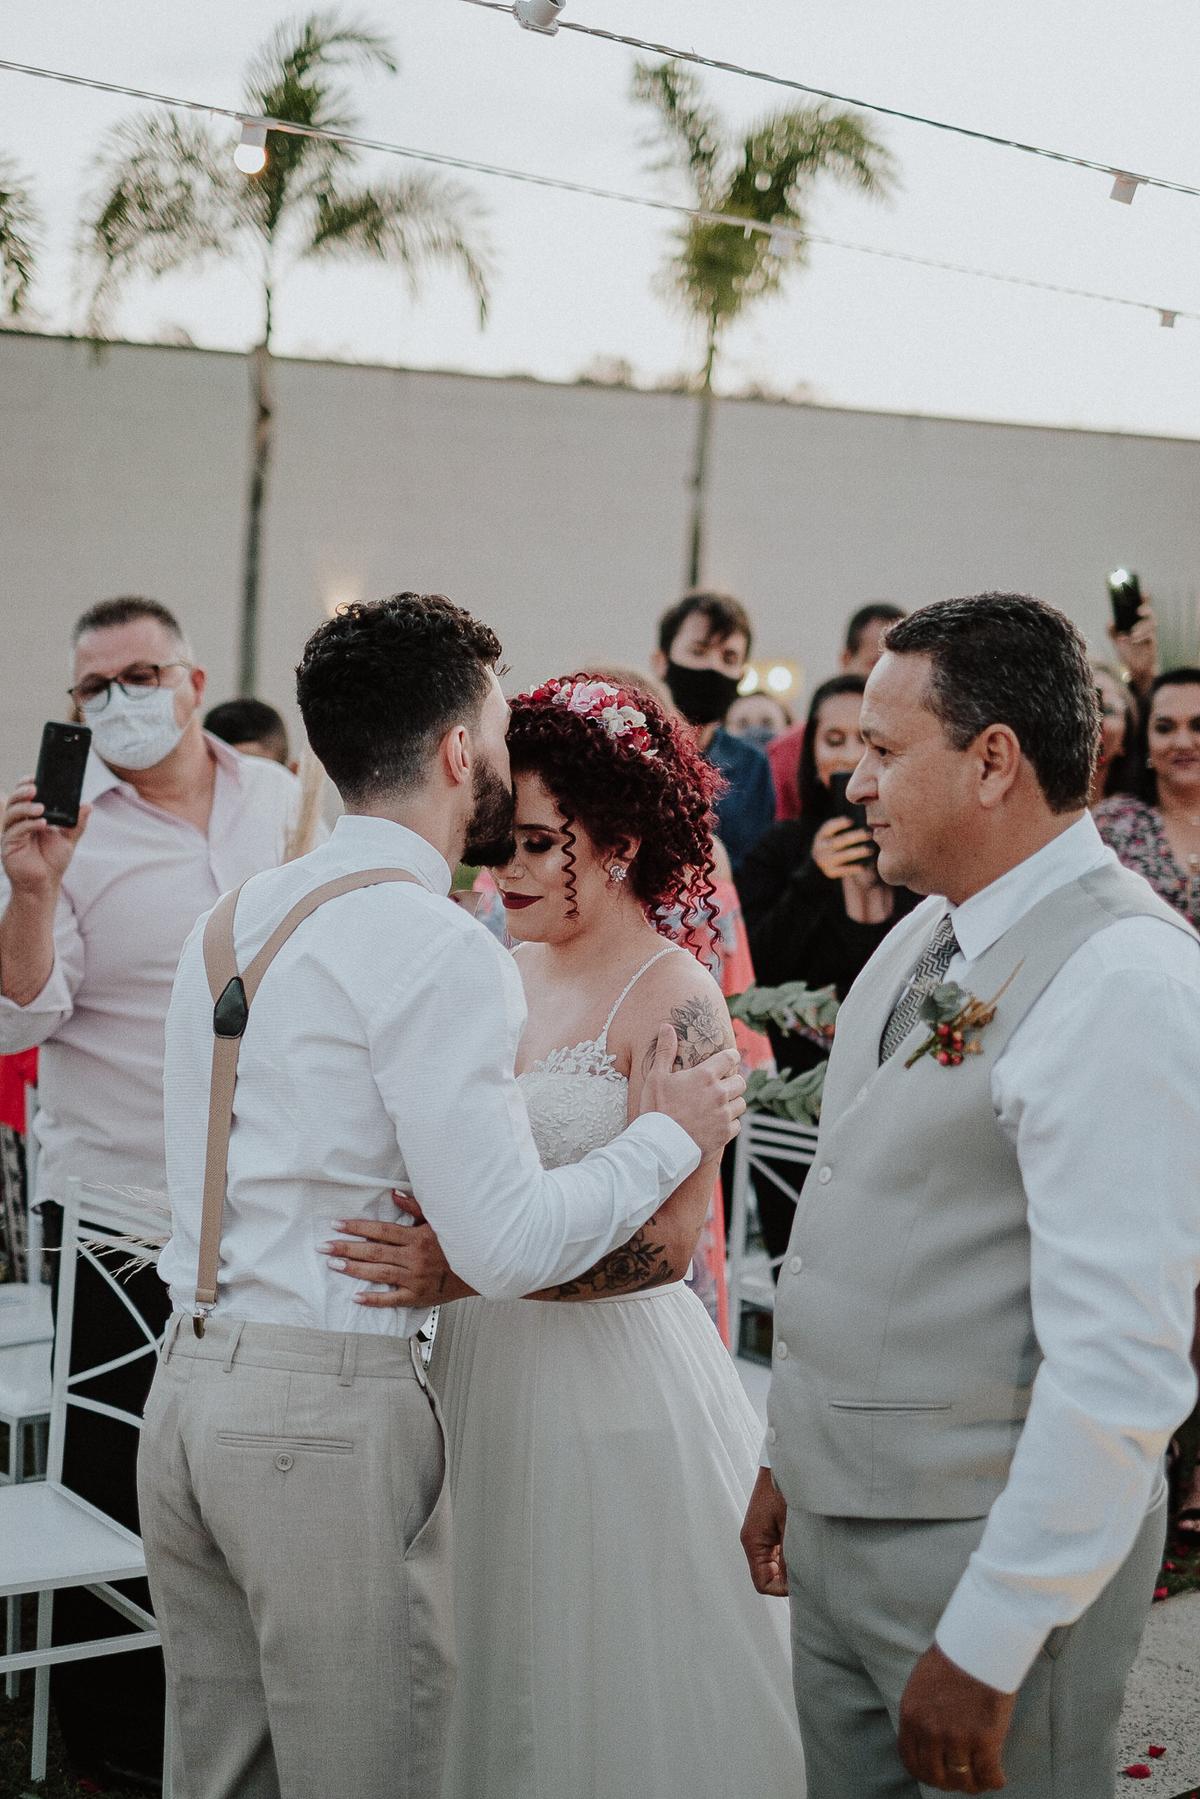 vestido de noiva casar no campo rancho verde eventos campinas fotos por caio henrique ch  entrada da noiva elopement wedding